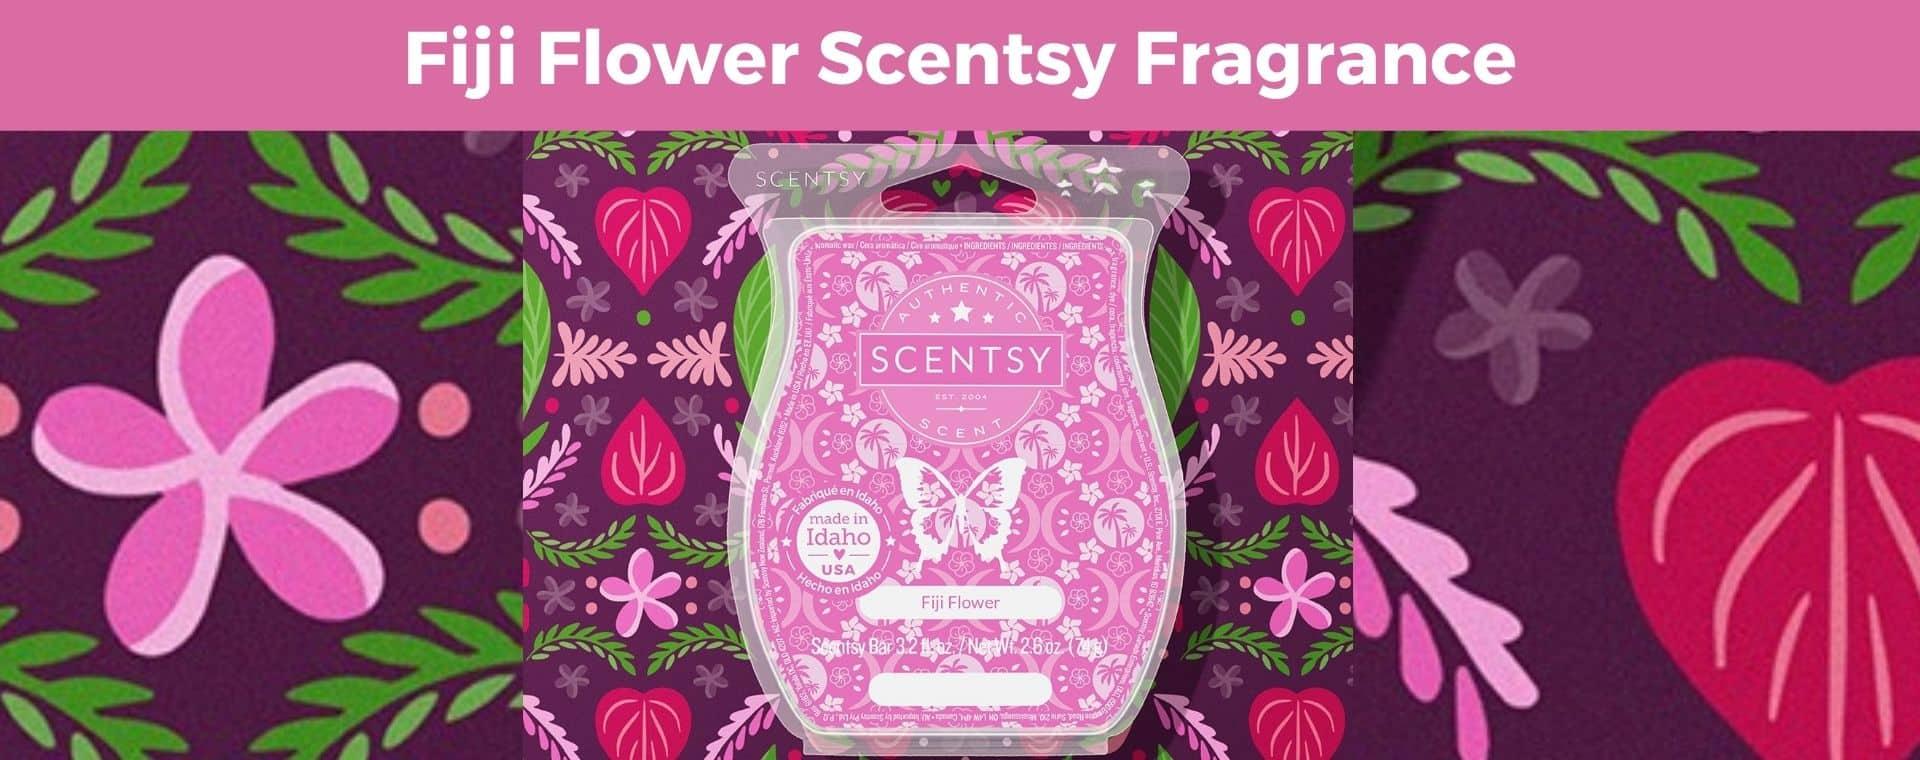 Fiji Flower Scentsy Fragrance